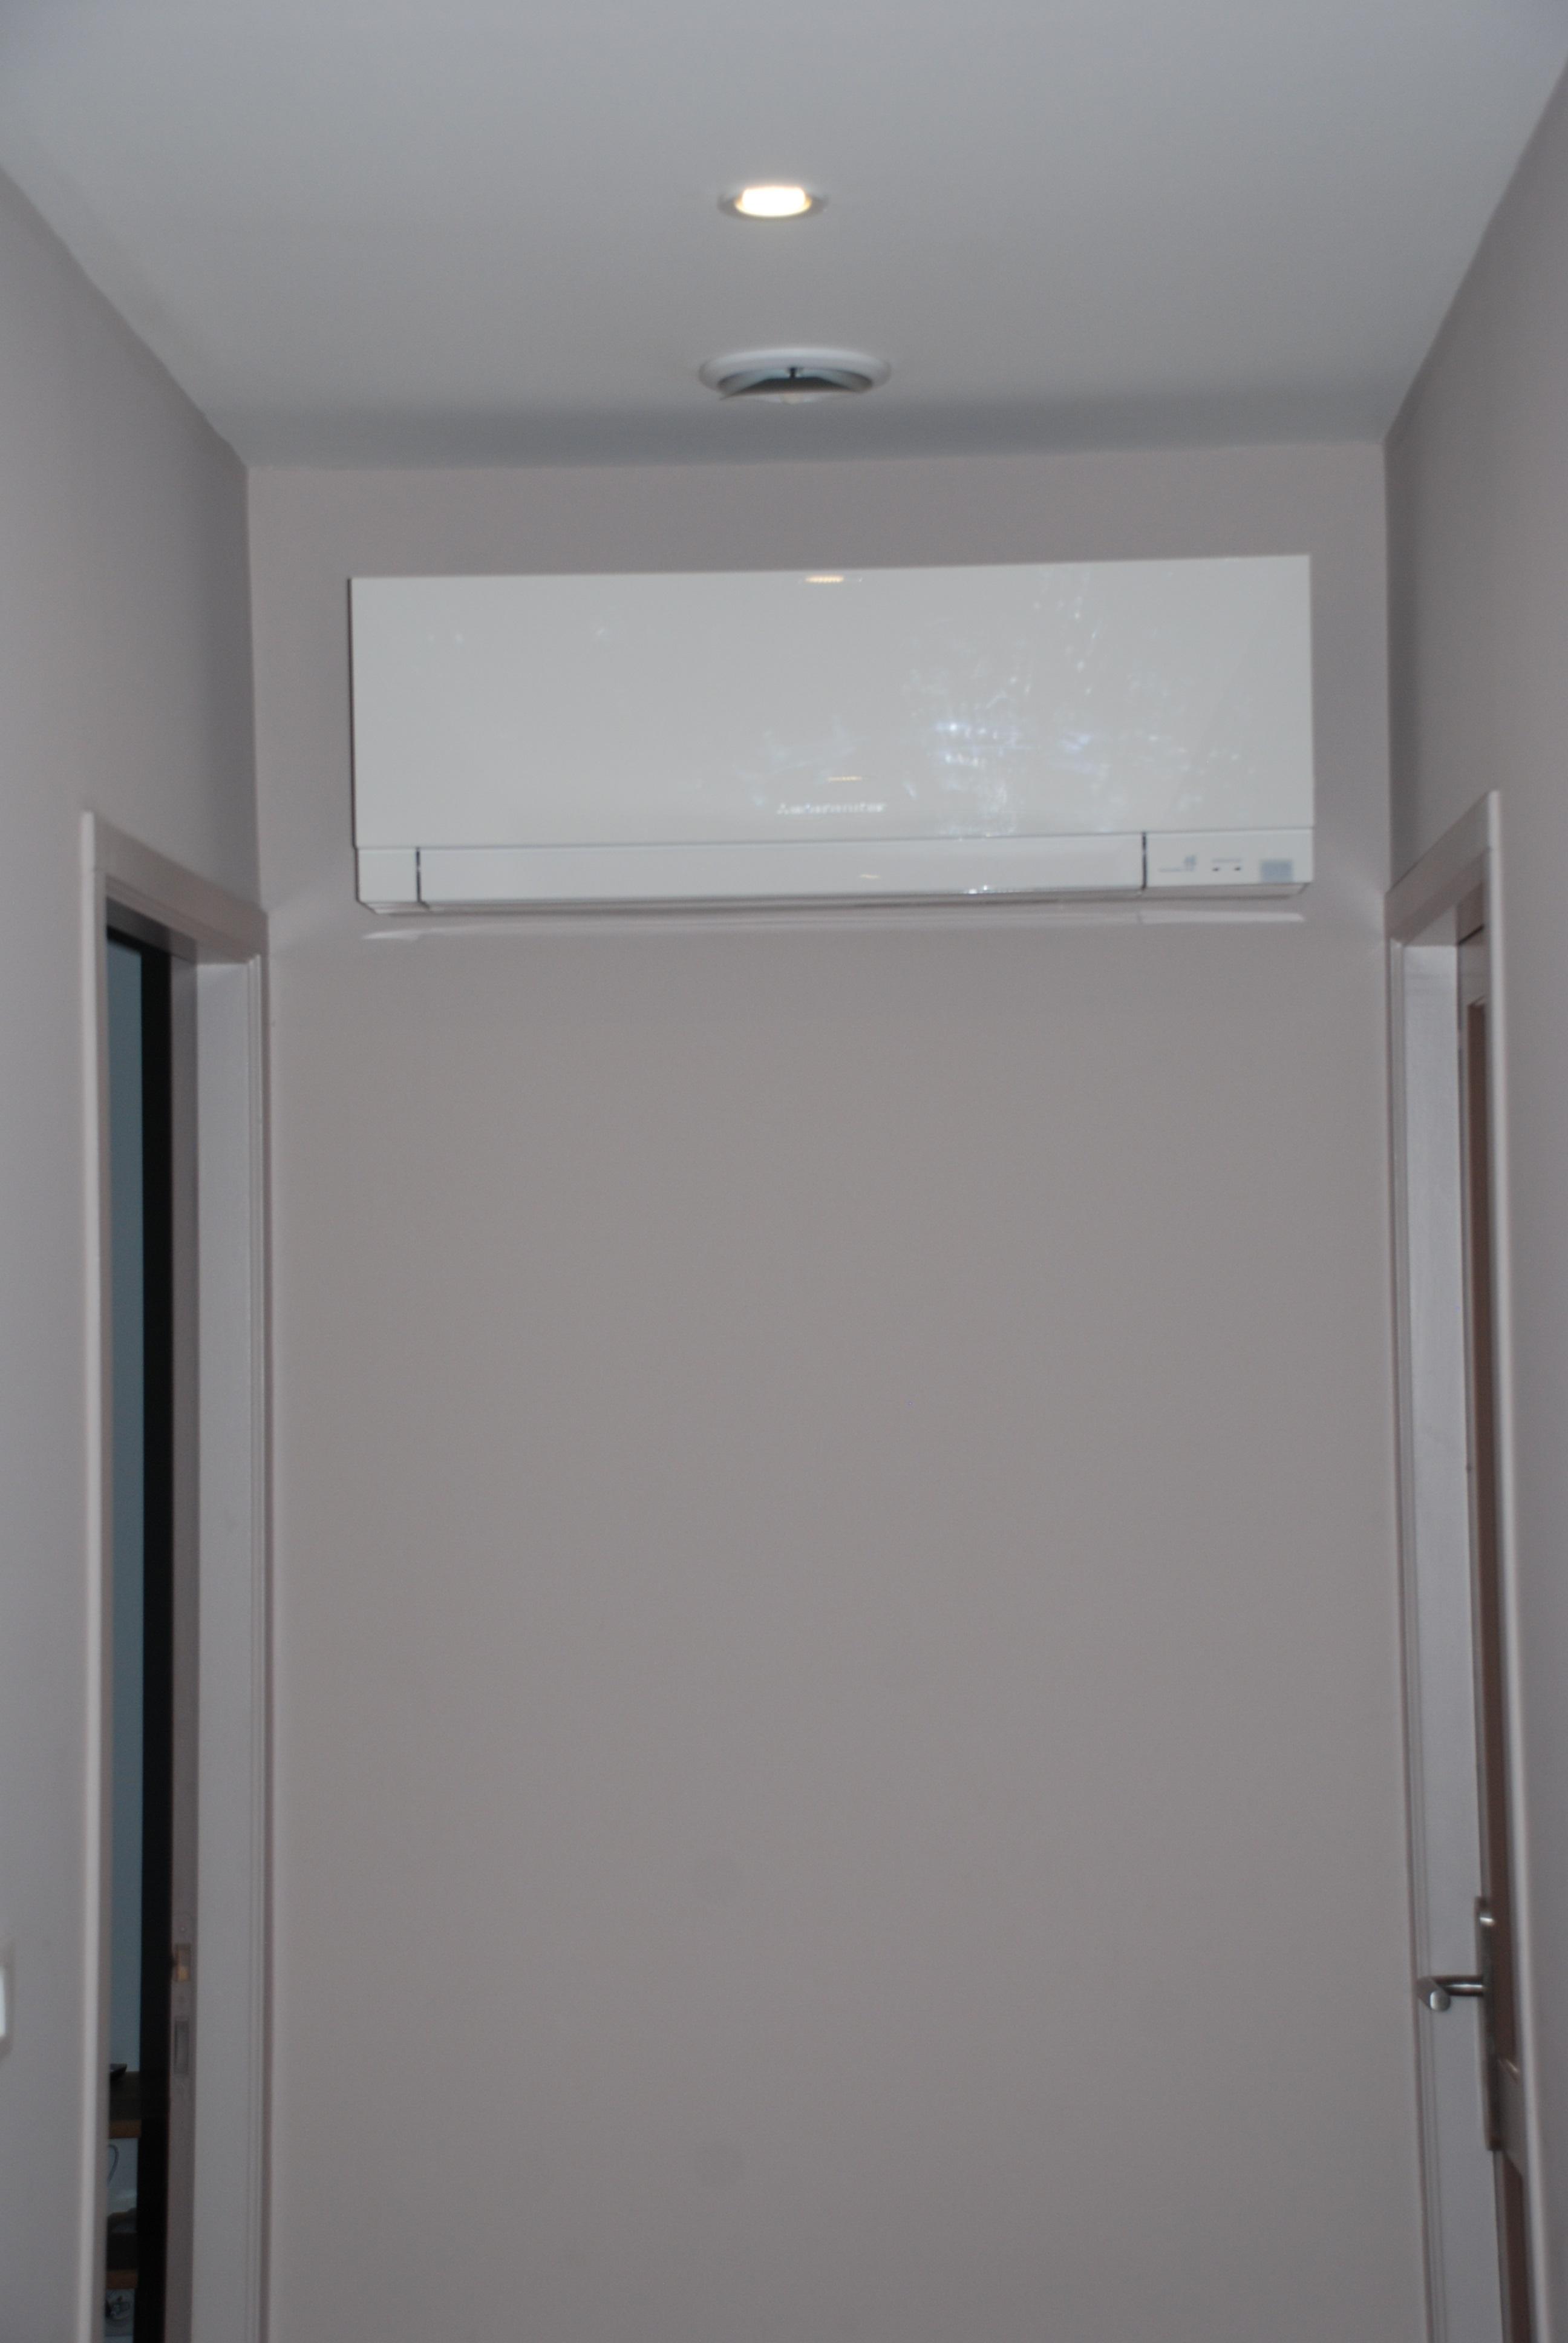 installation de climatisation travaux renovation climatisation chauffage. Black Bedroom Furniture Sets. Home Design Ideas